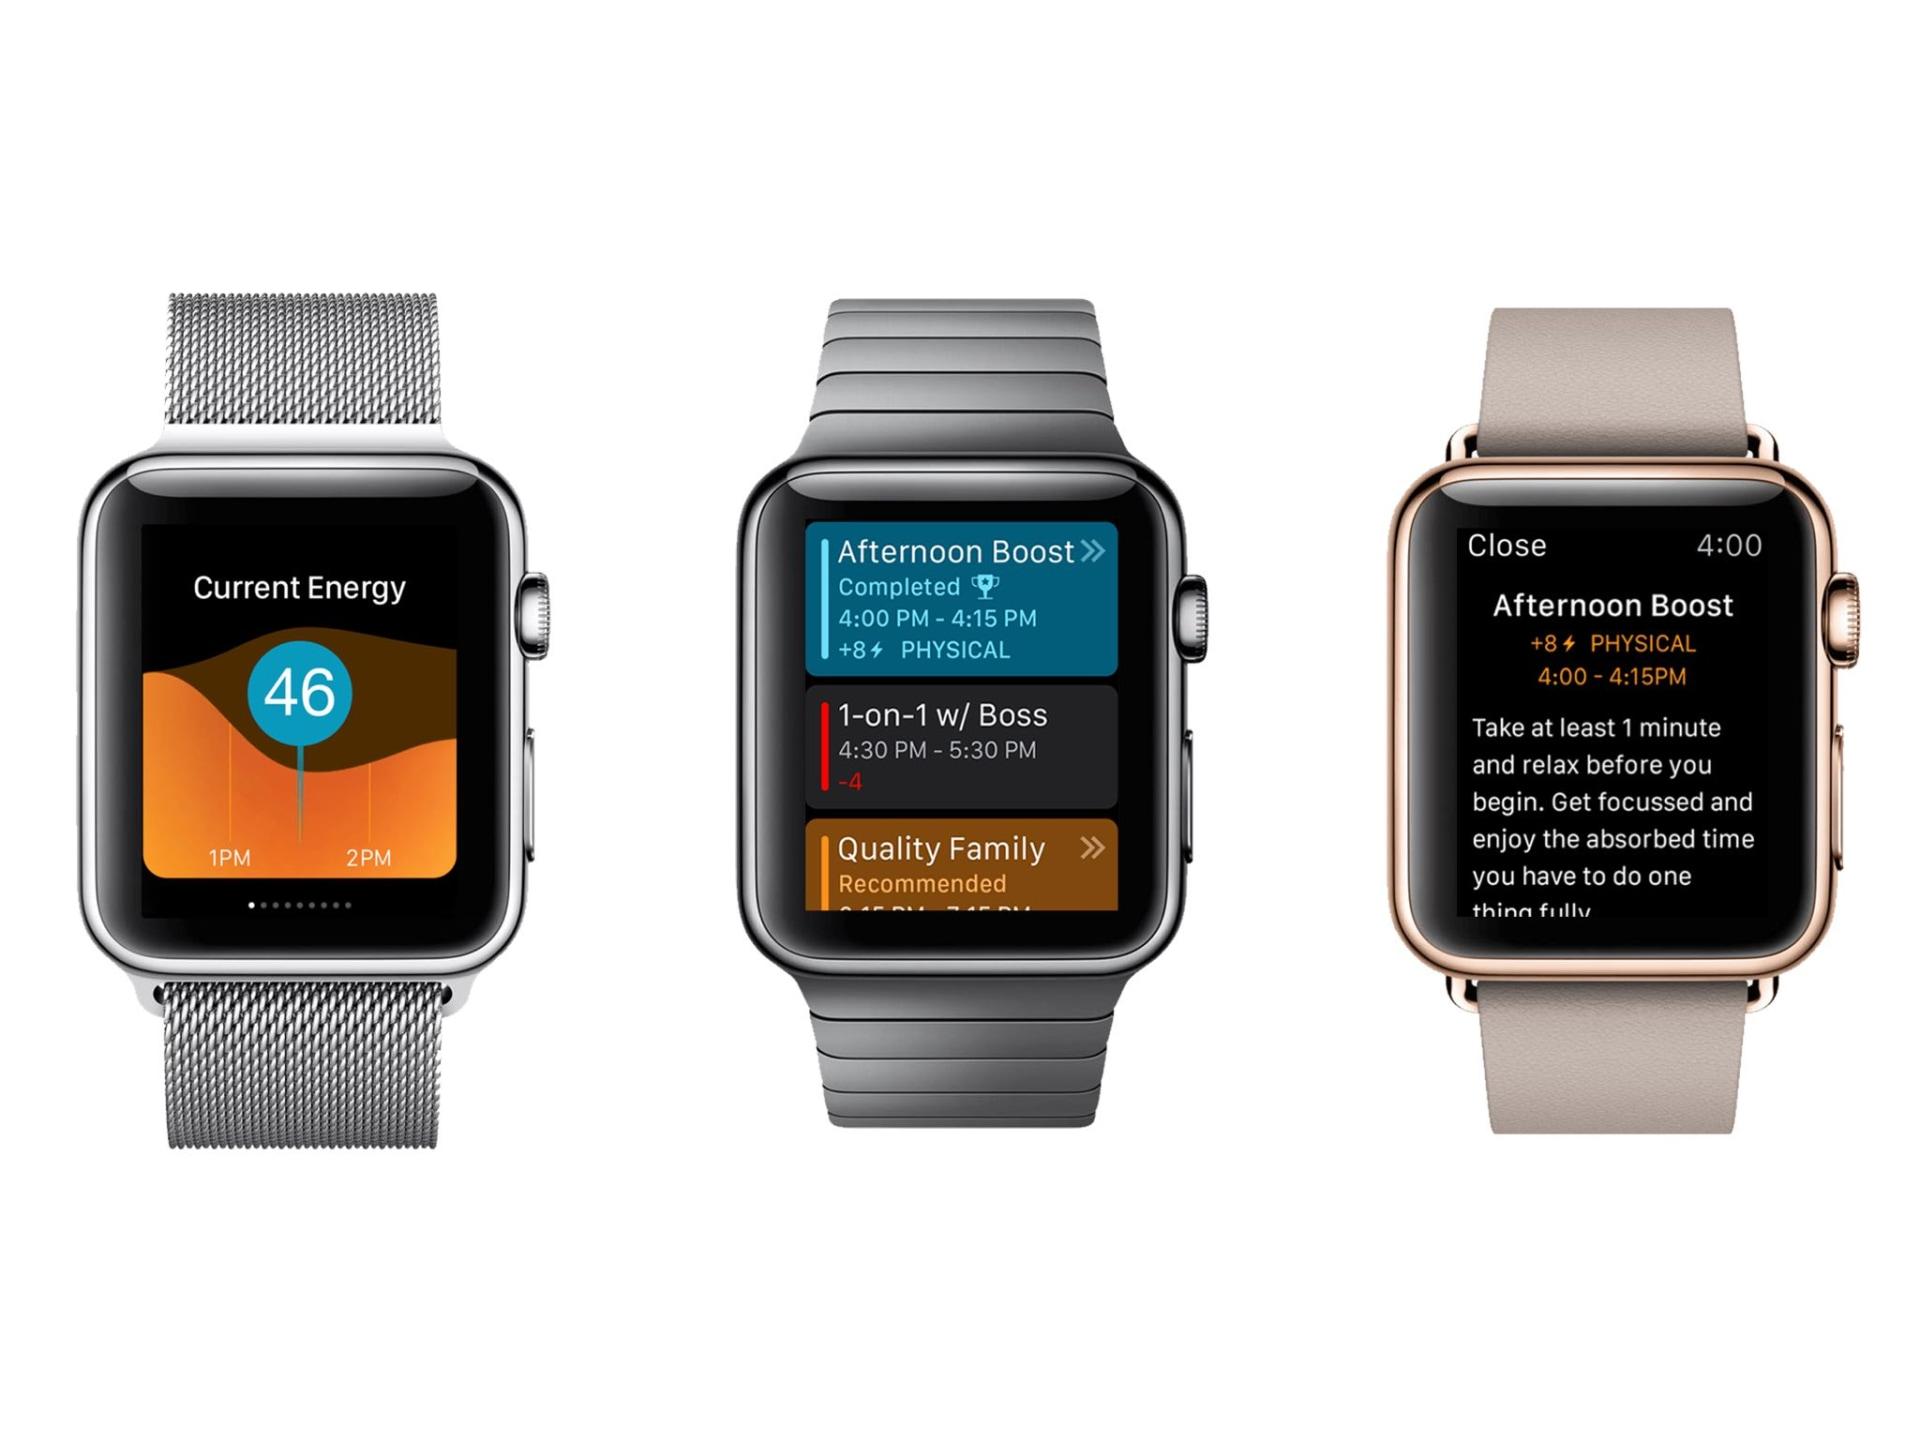 Energi-App-3-Screens-AppleWatch-Rocksauce-Studios